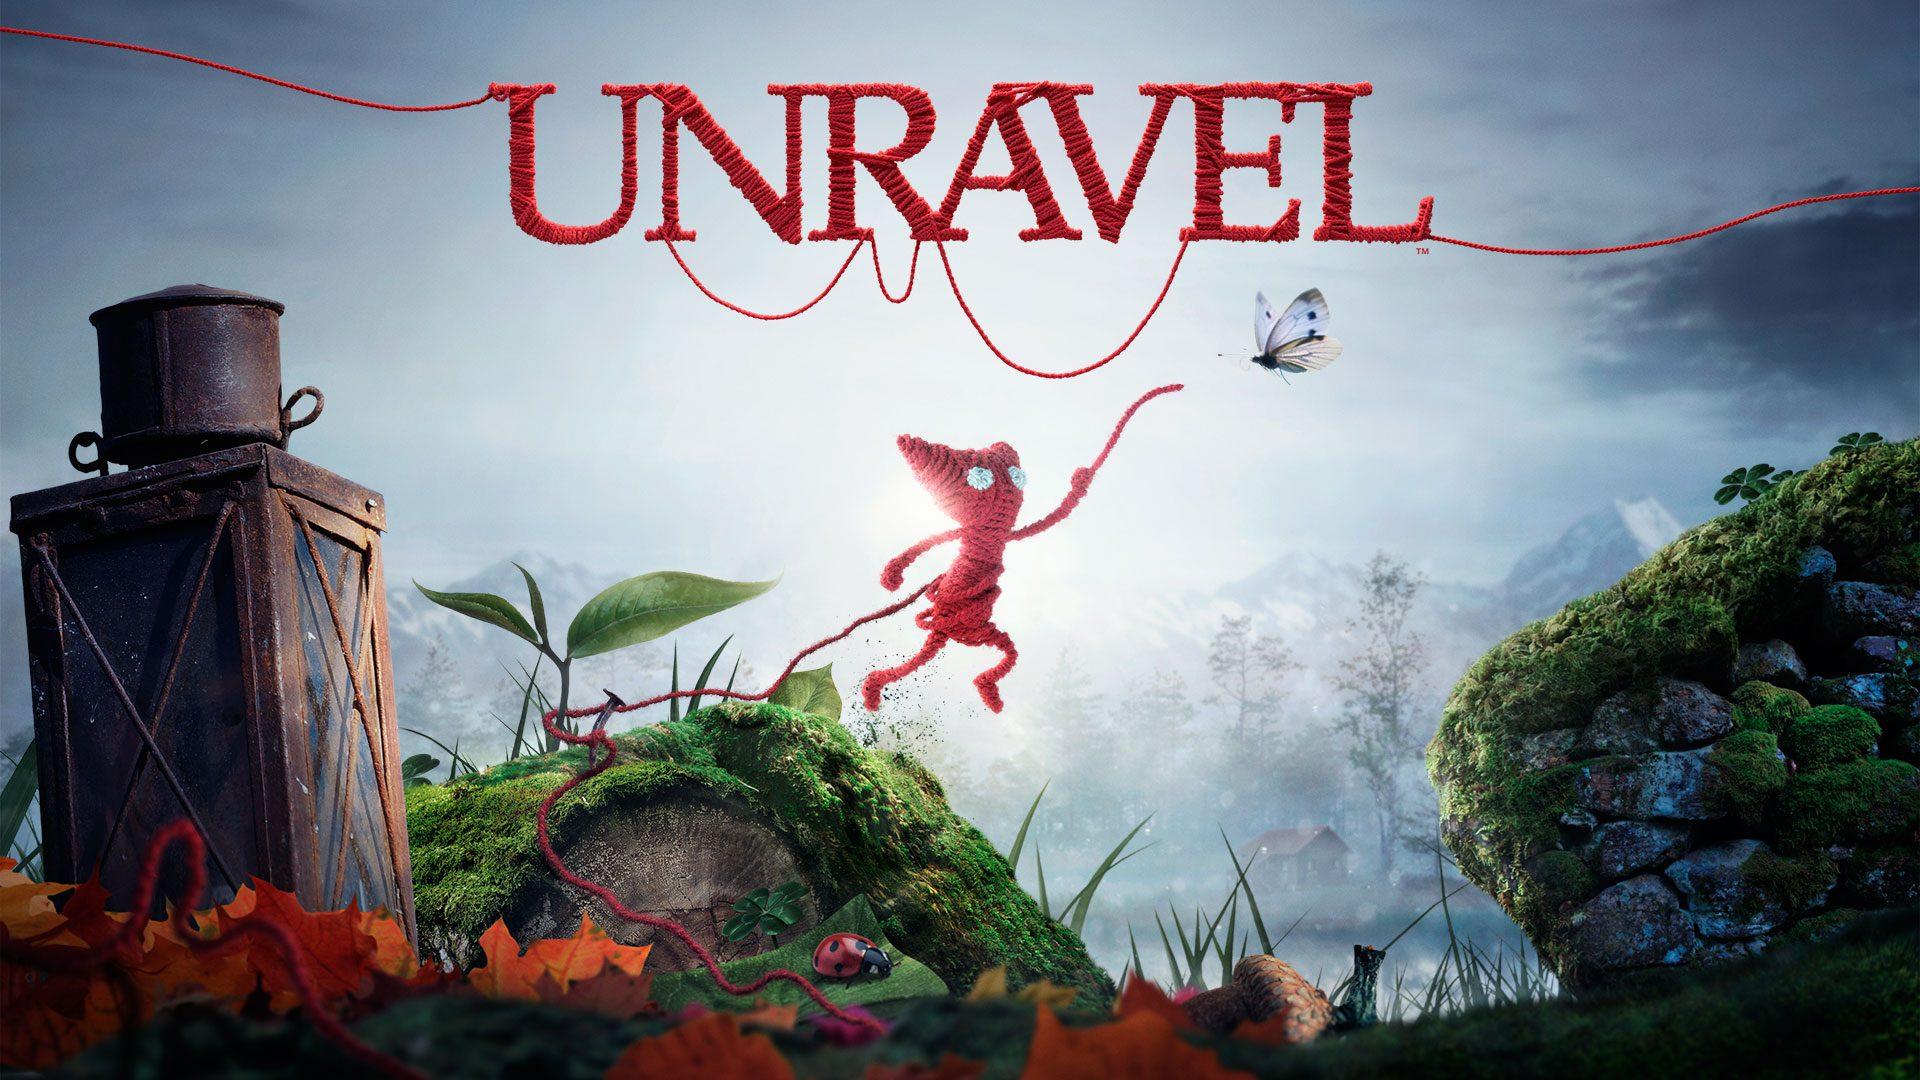 unravel_swiss_gaming.jpg